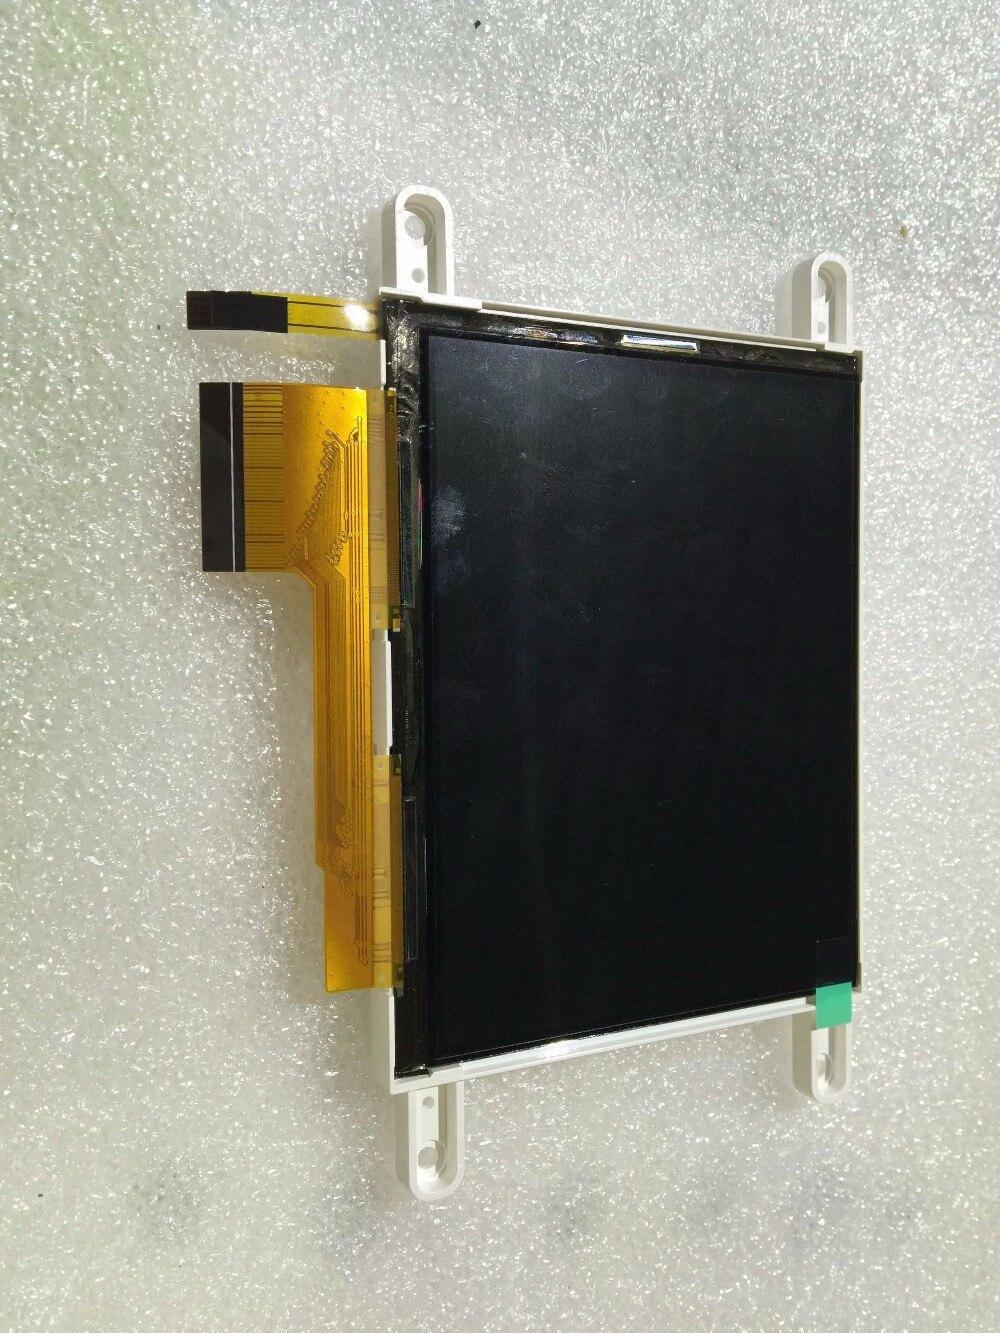 Original 5 inch industrial screen TM050QDH06 peg 5 inch tm050qdh06 new in original packaging industrial lcd screen